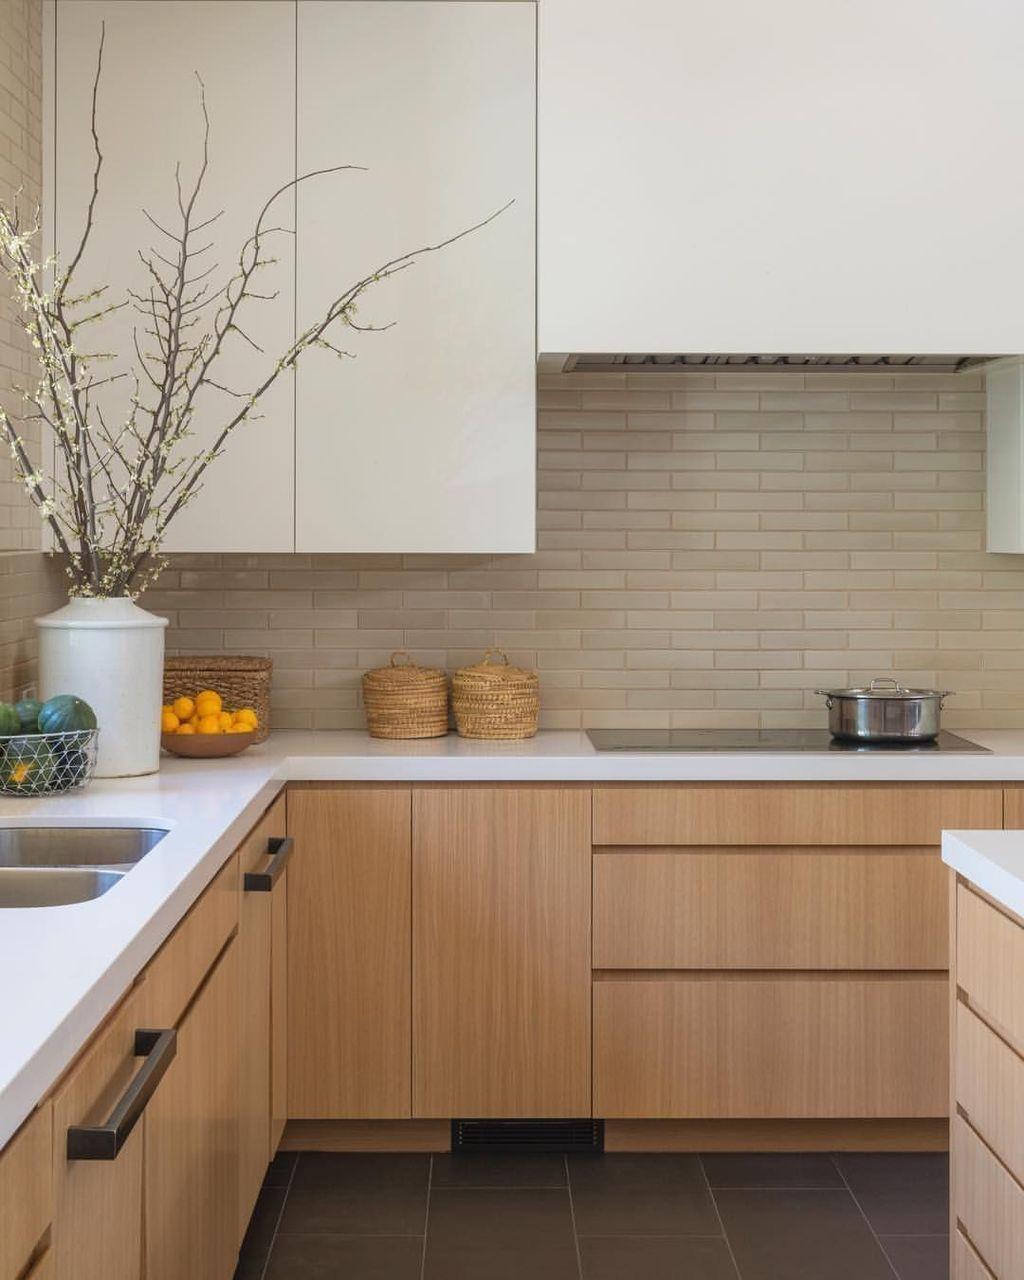 Popular Minimalist Kitchen Design Ideas You Never Seen Before 20